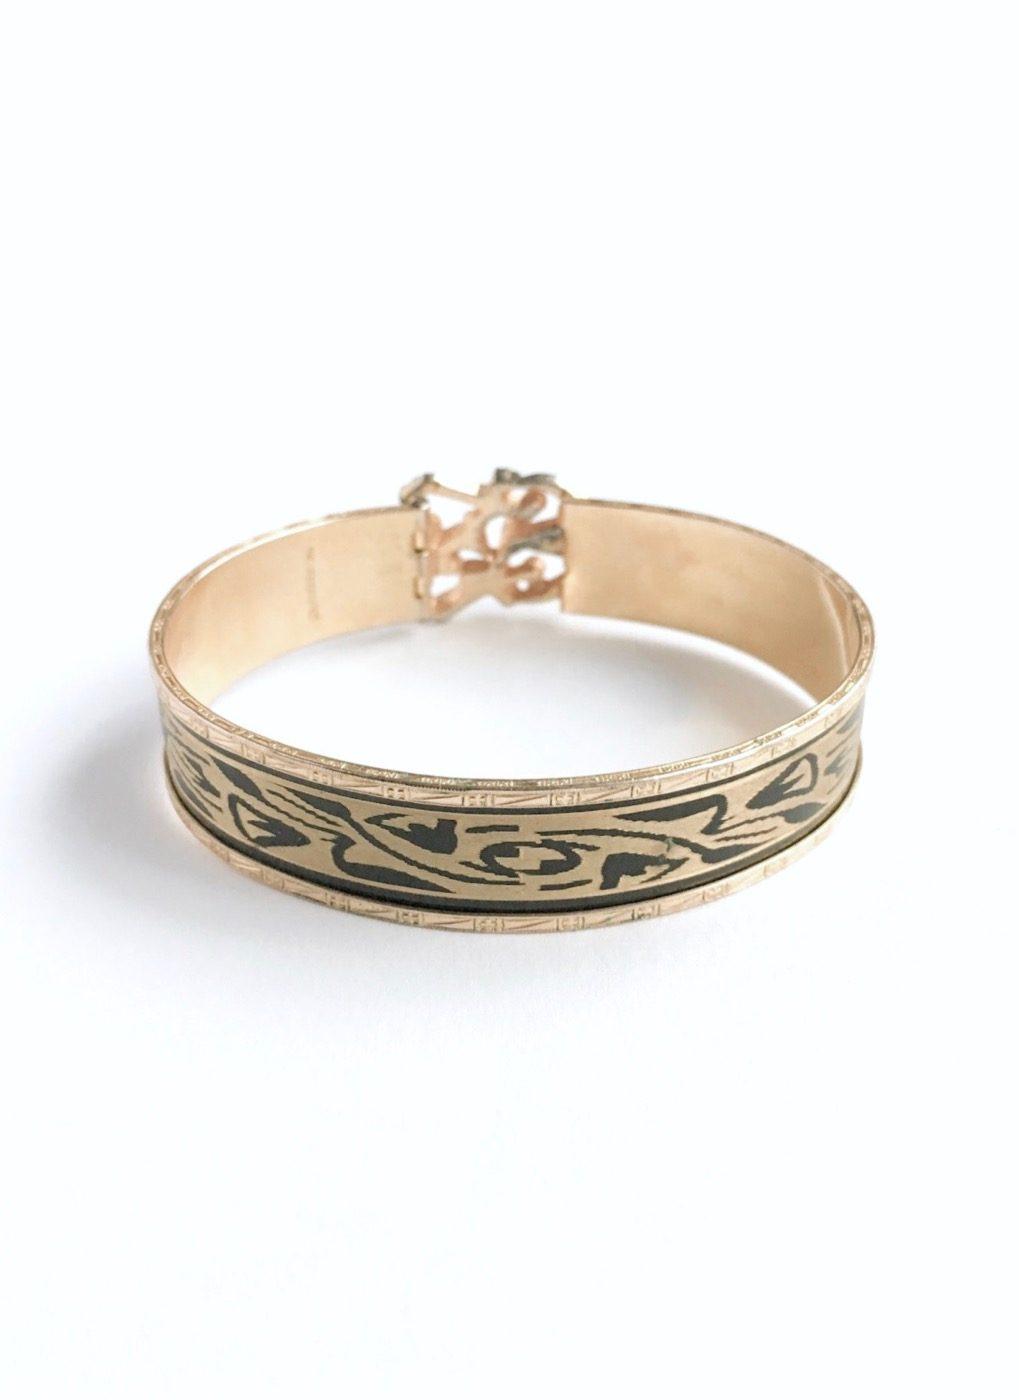 1930s JJ White damascene cuff bracelet